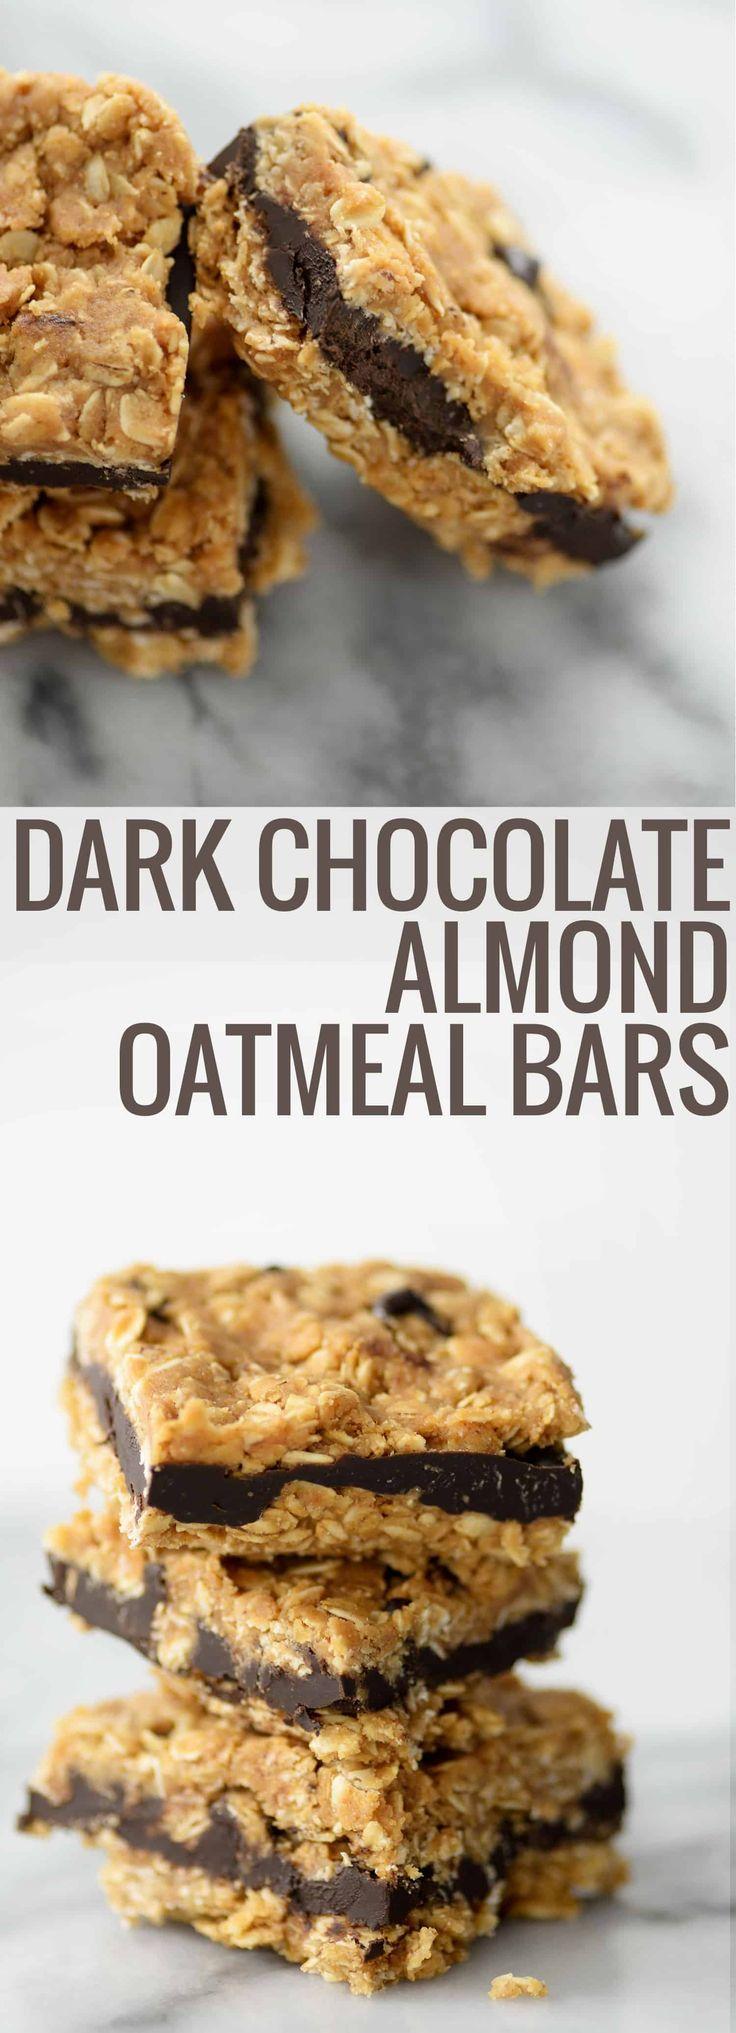 Vegan Dark Chocolate Almond Oatmeal Bars. You've gotta try these naturally sweetened oatmeal cookie bars, layered with dark chocolate almond butter. Vegan   #granolabars